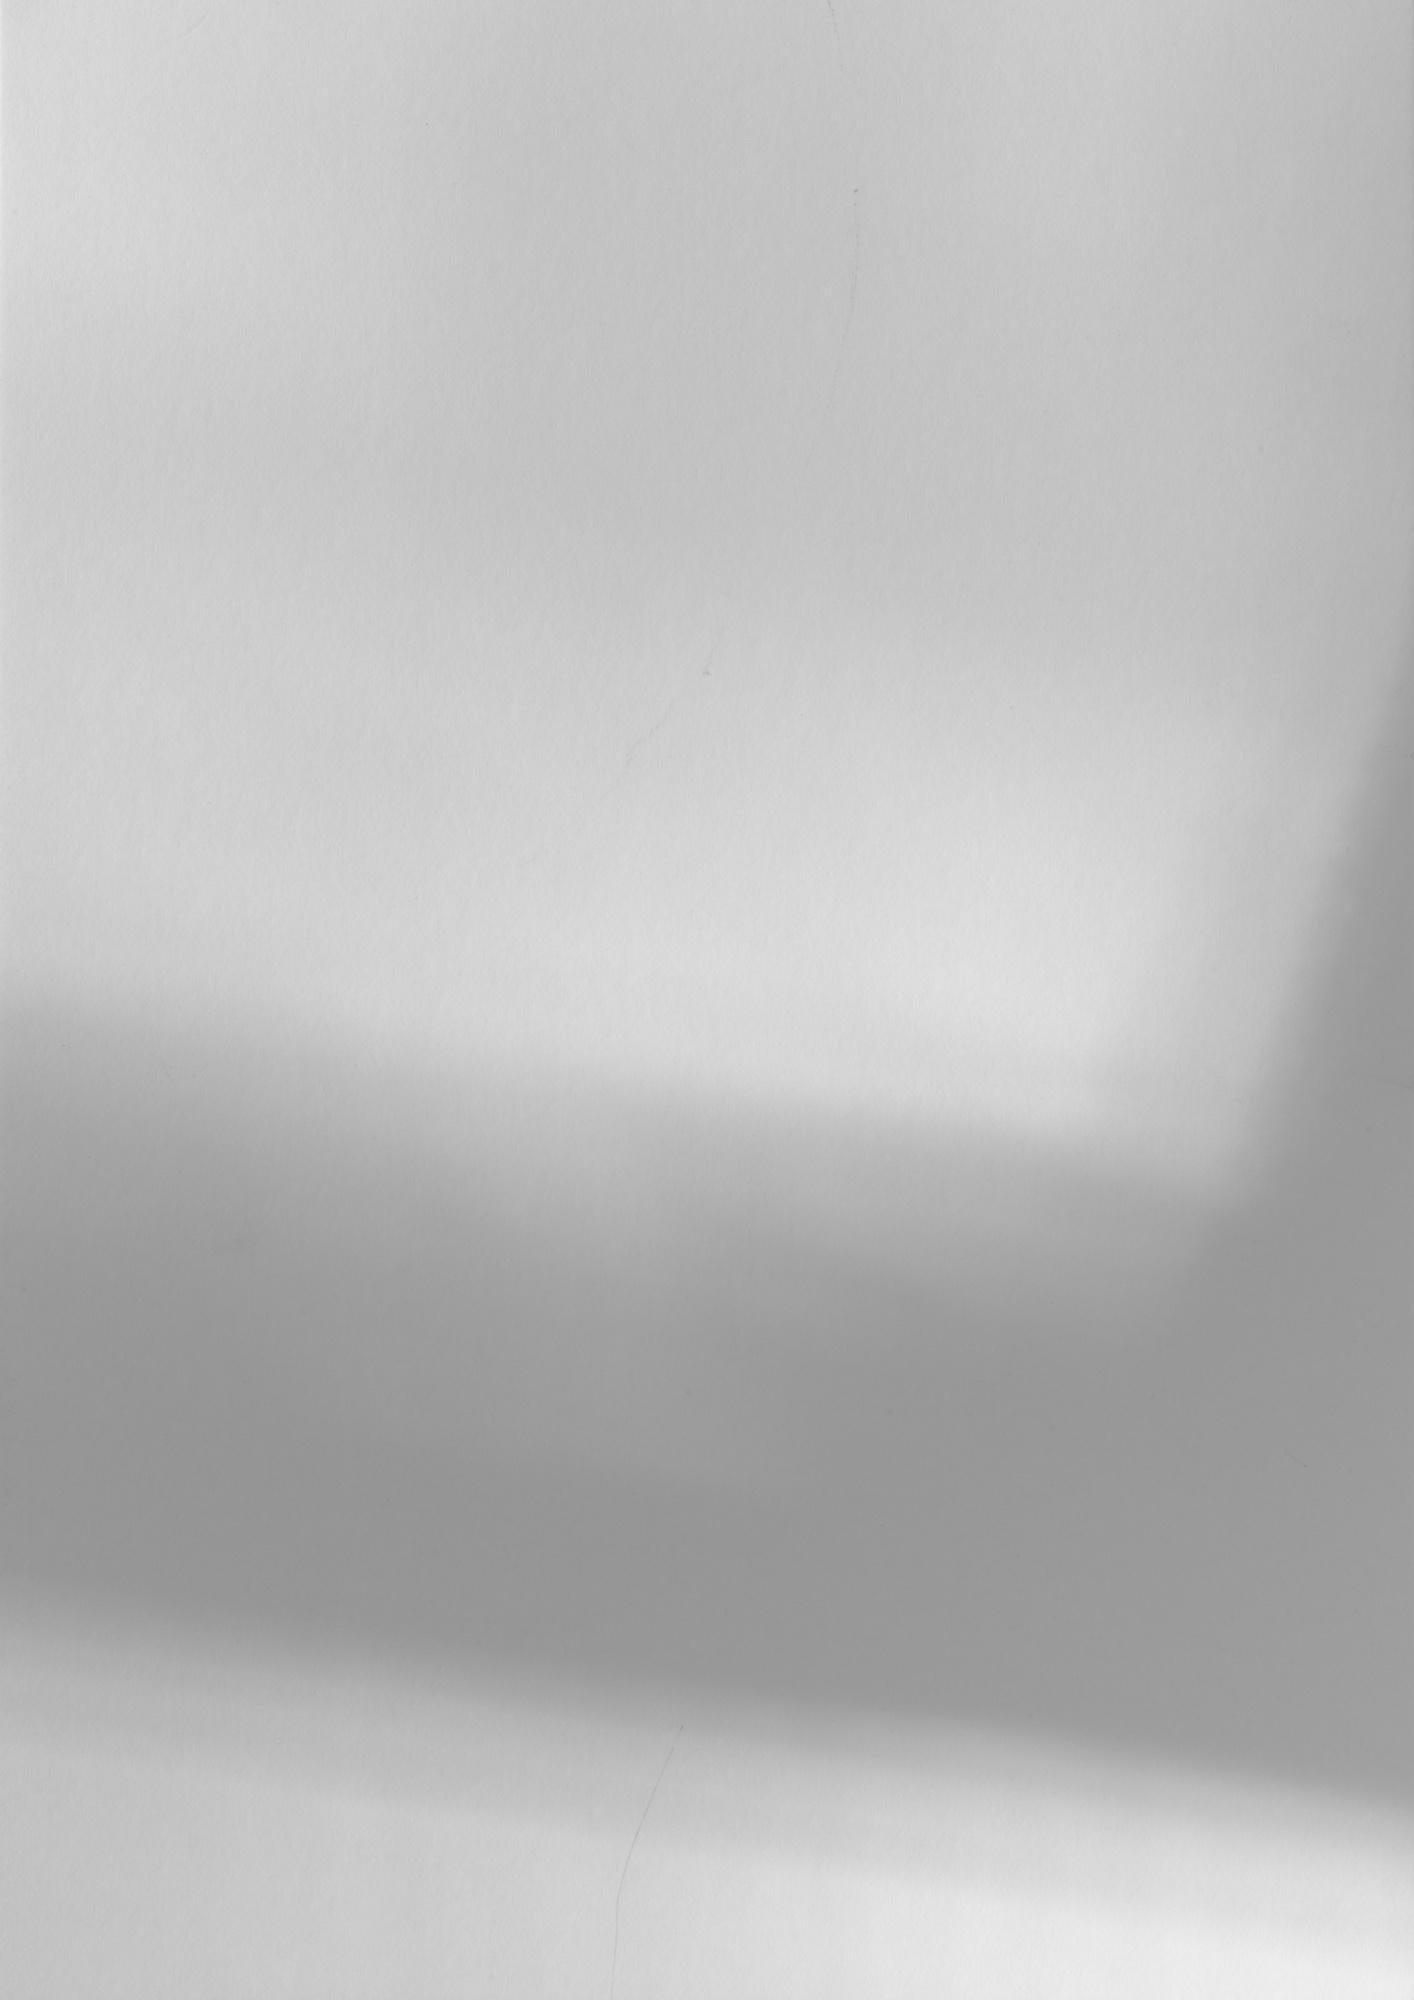 L1010138.jpg